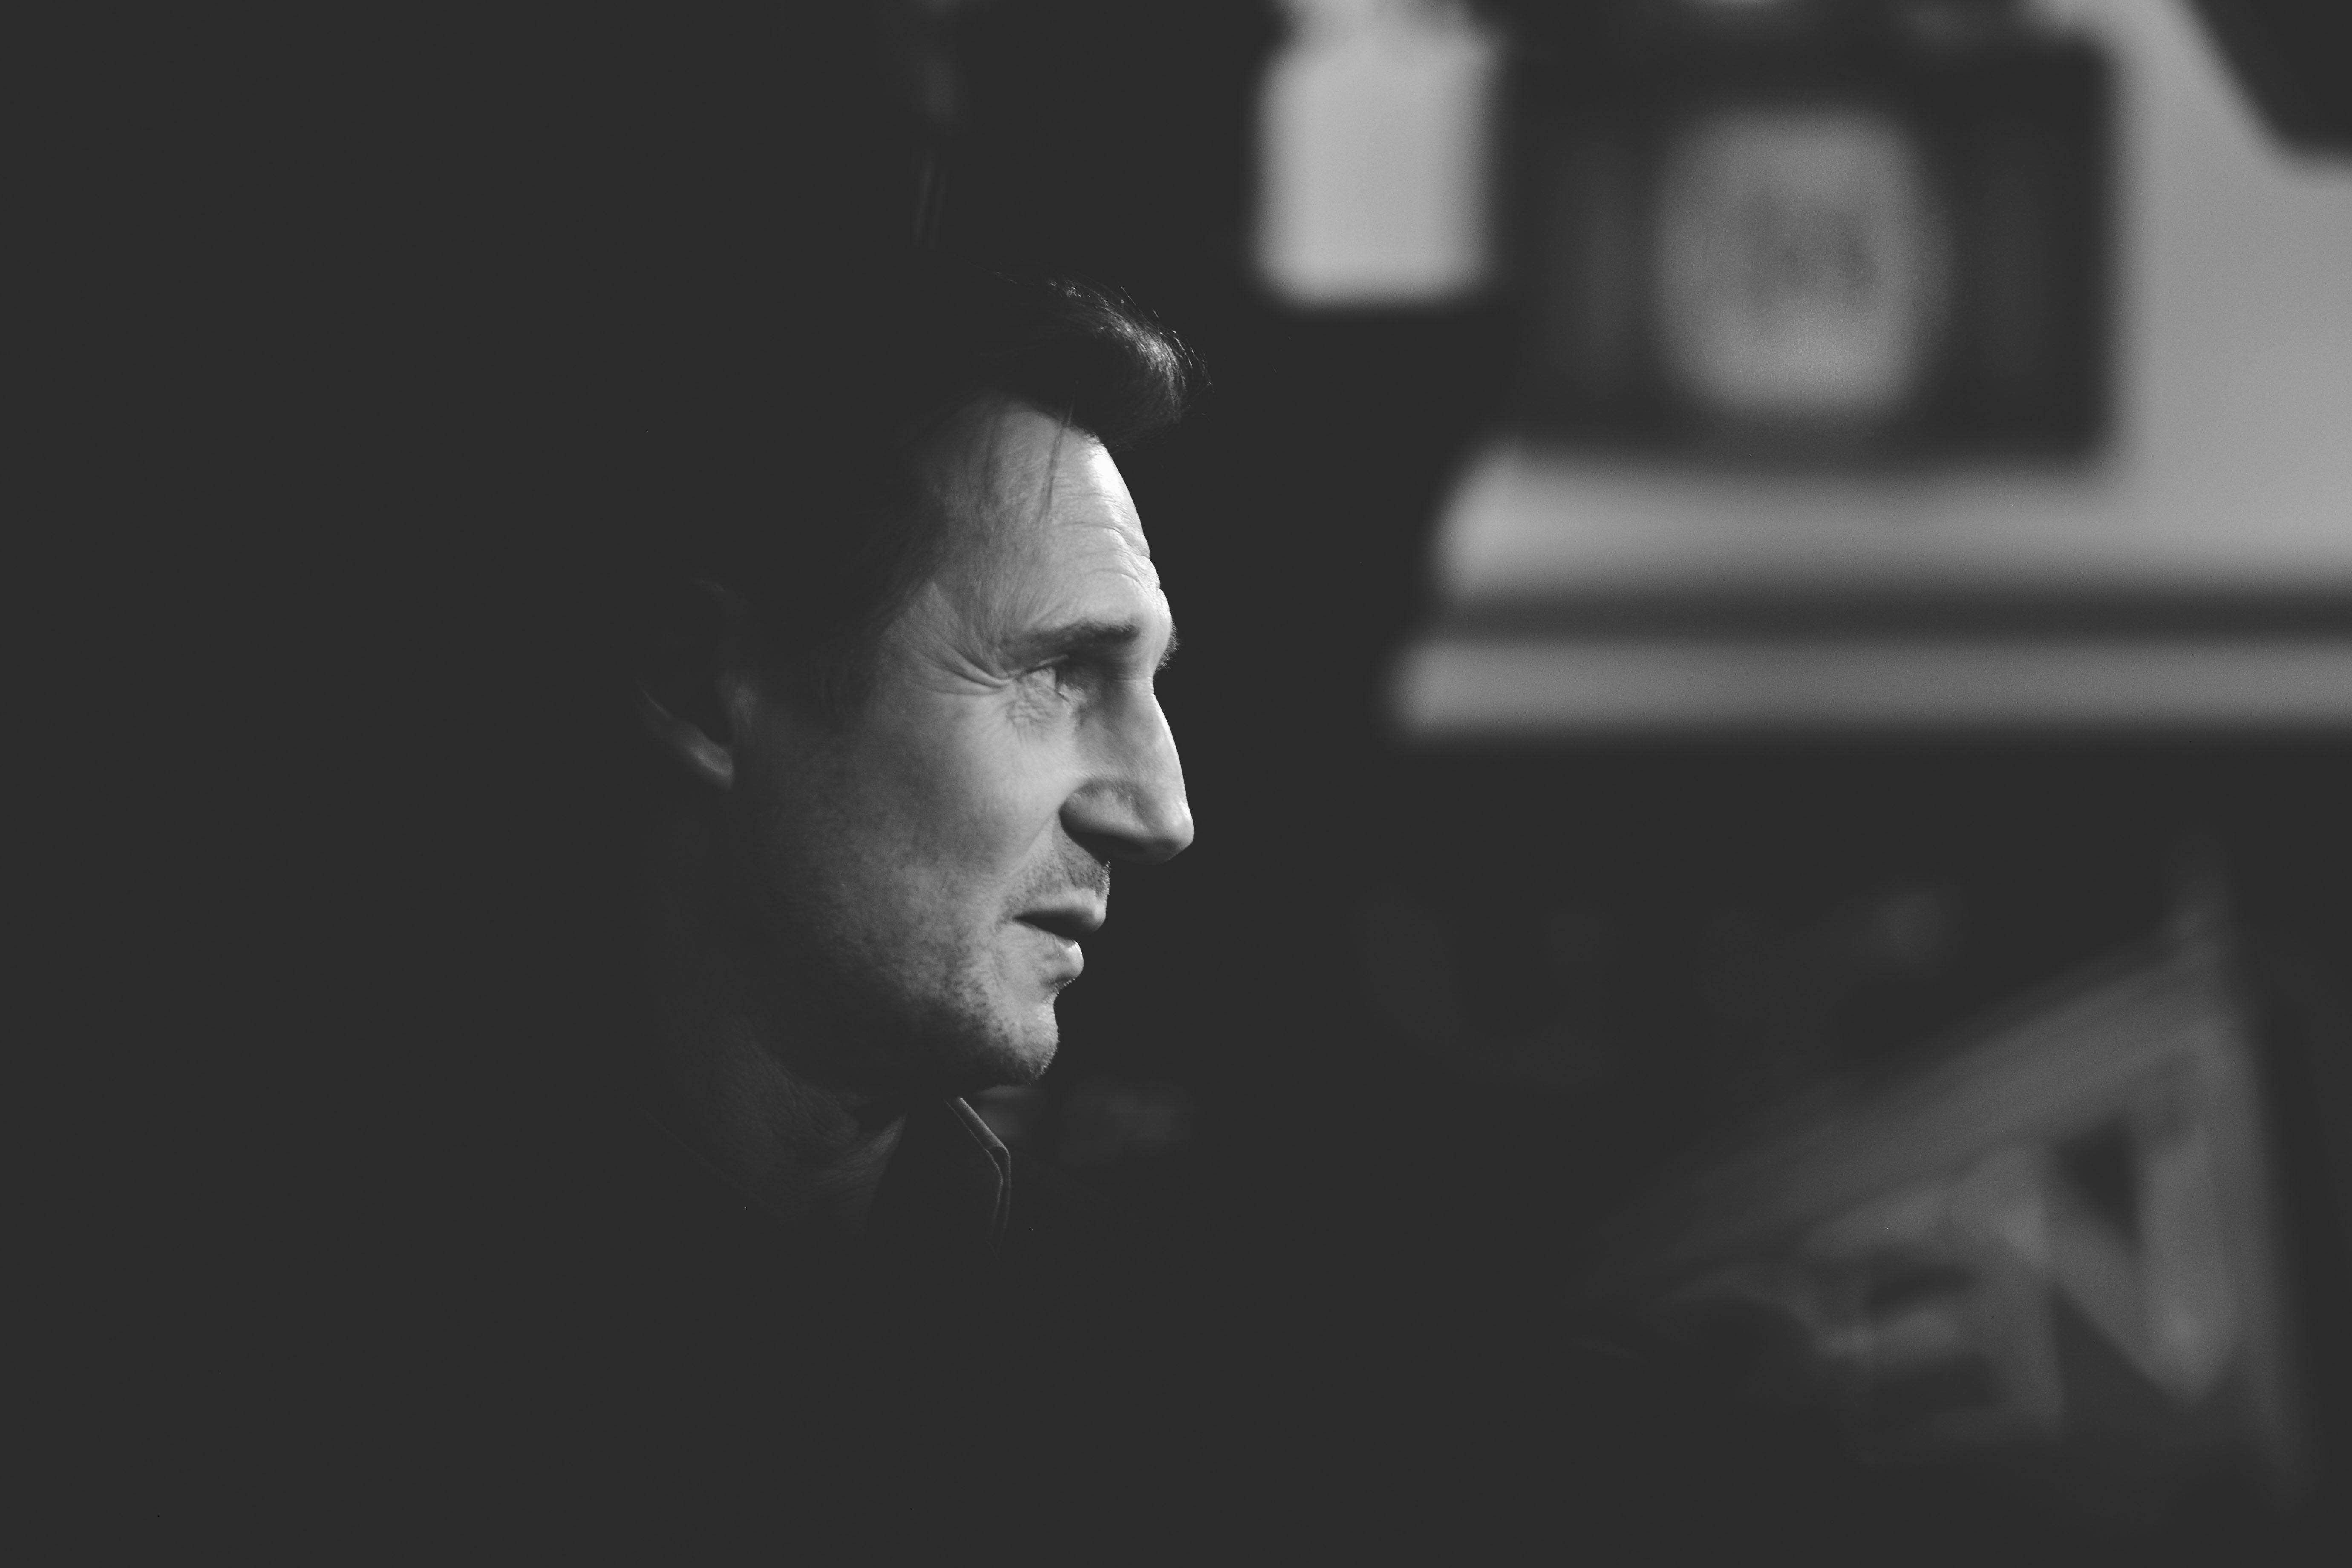 People 5520x3680 Liam Neeson monochrome actor dark